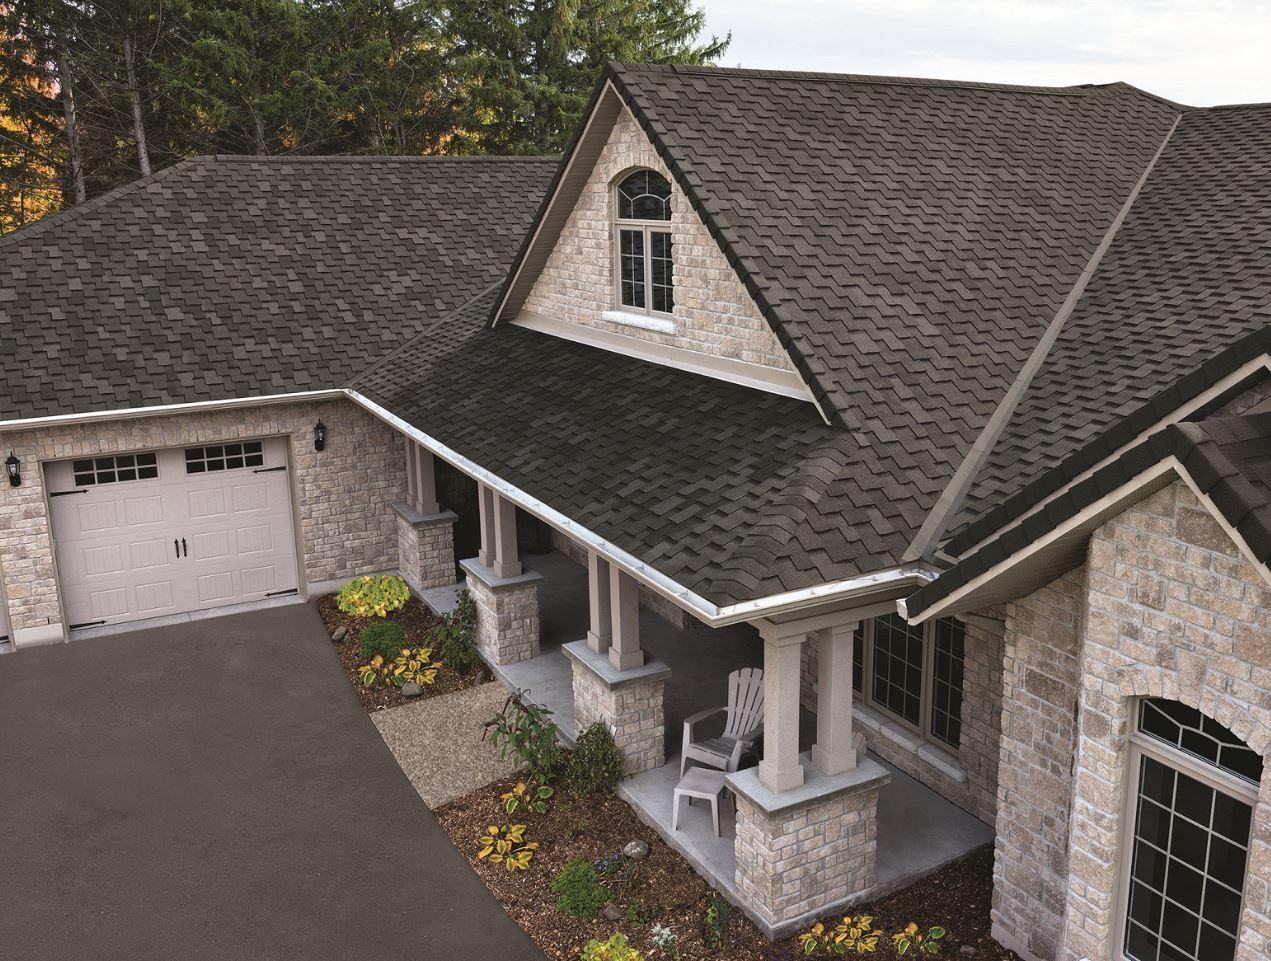 Asphalt Roofing Solution Provides Cedar Shake Alternative